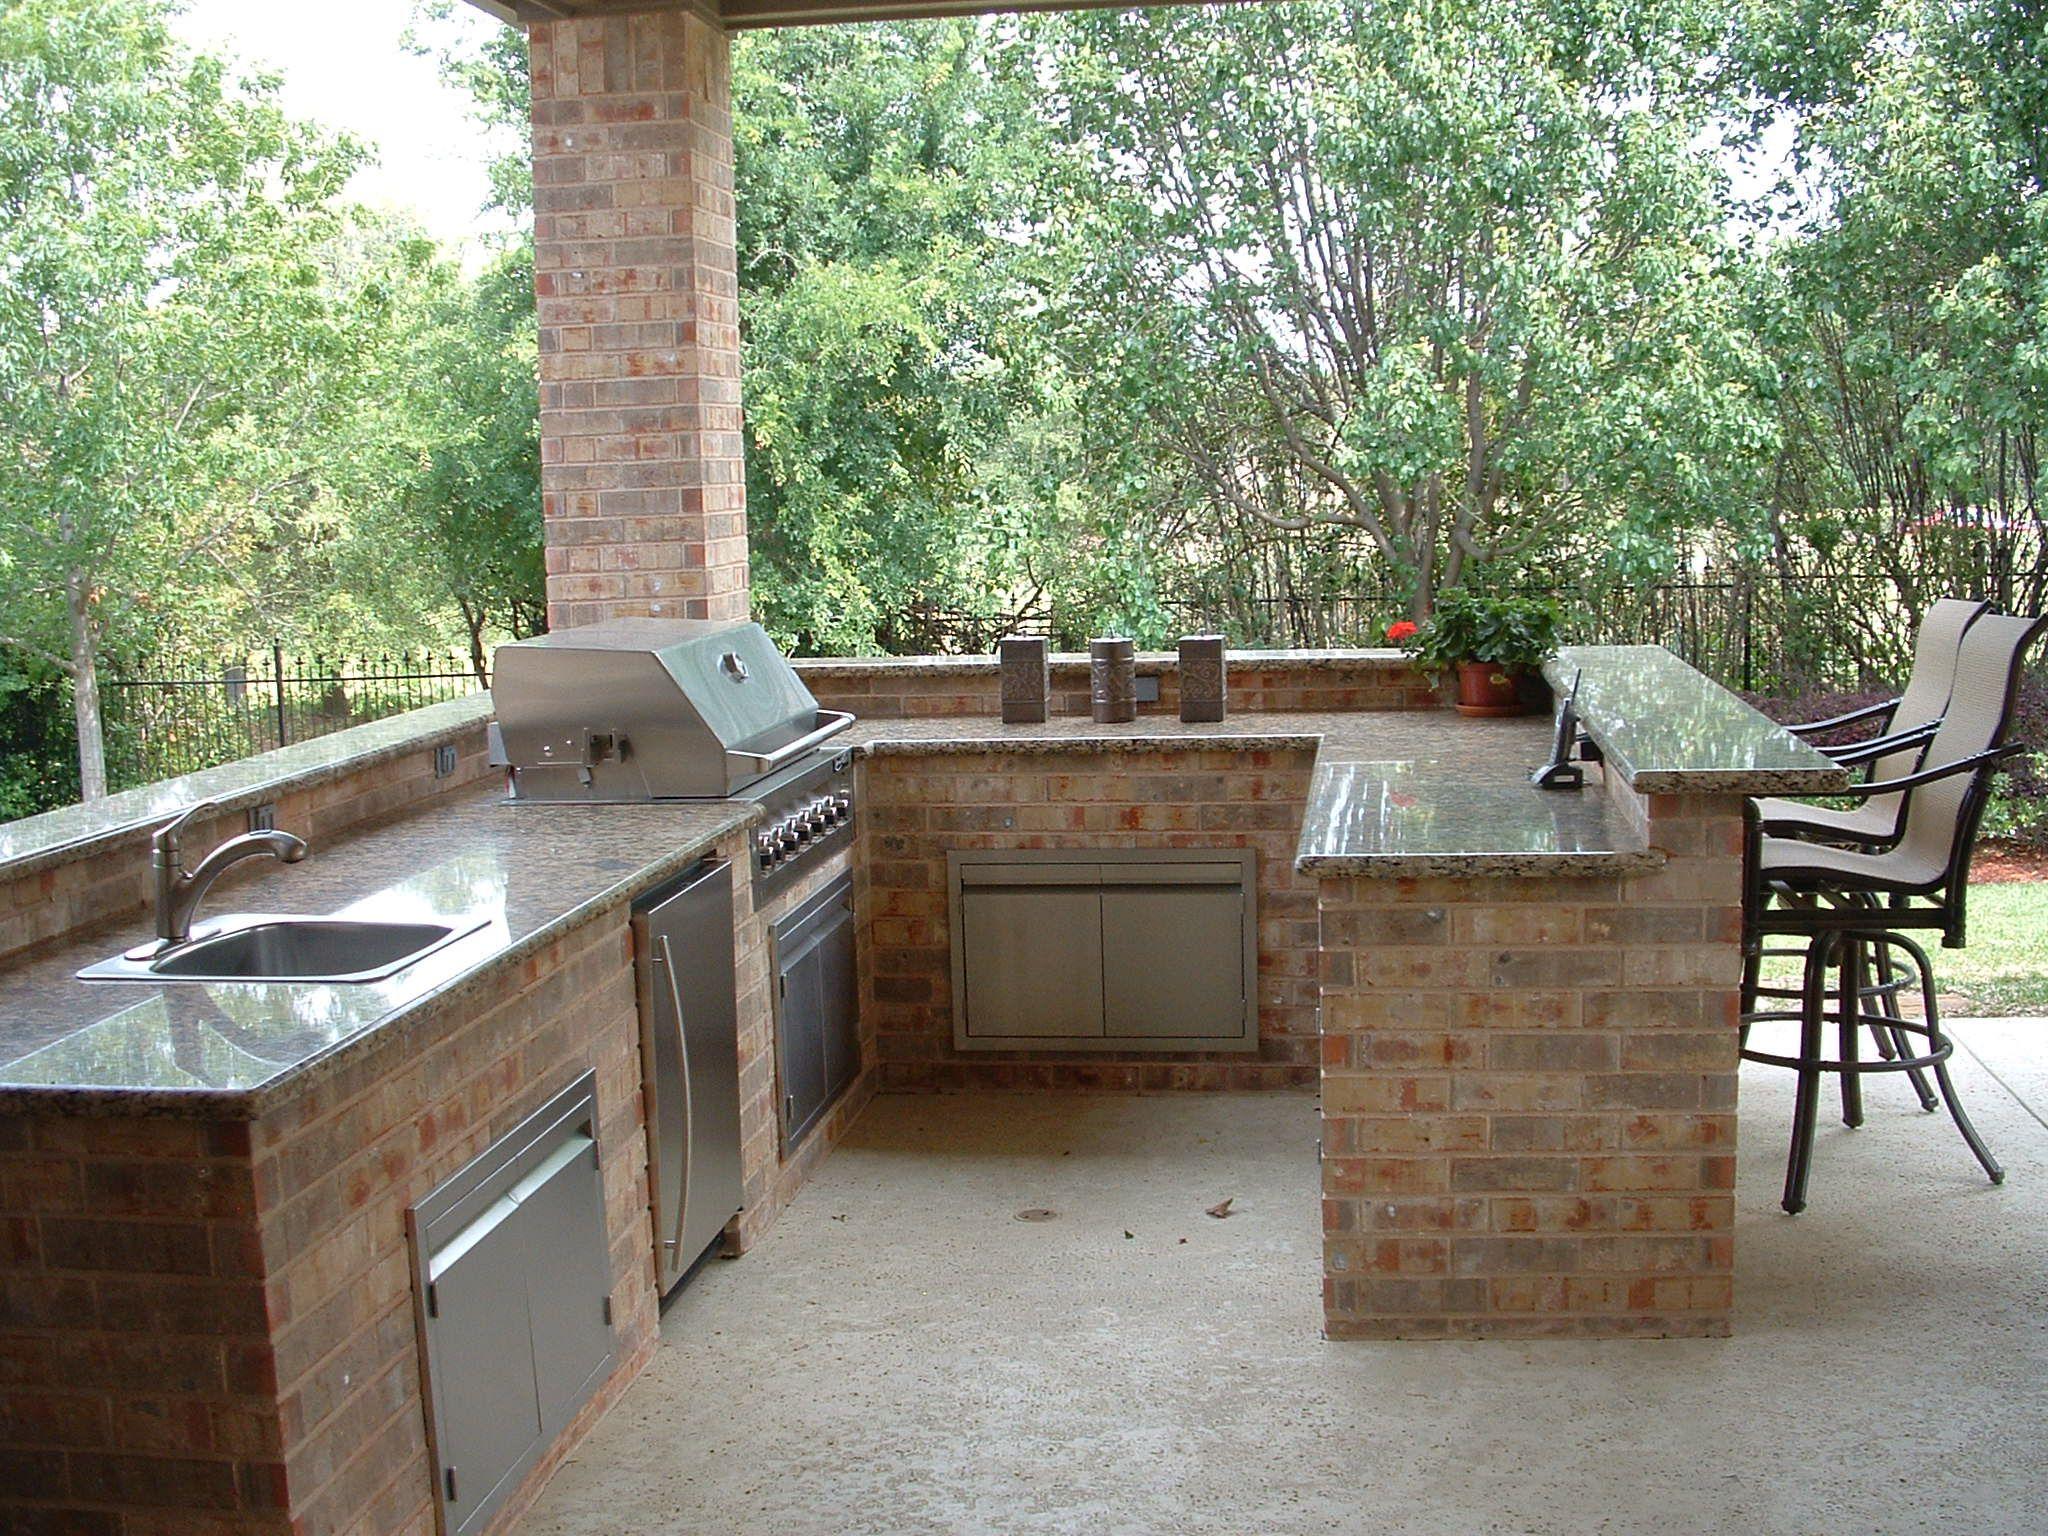 Outdoor Kitchen Bar Natural Stone Backsplash Plans Features Granite Countertops Southlake Texas